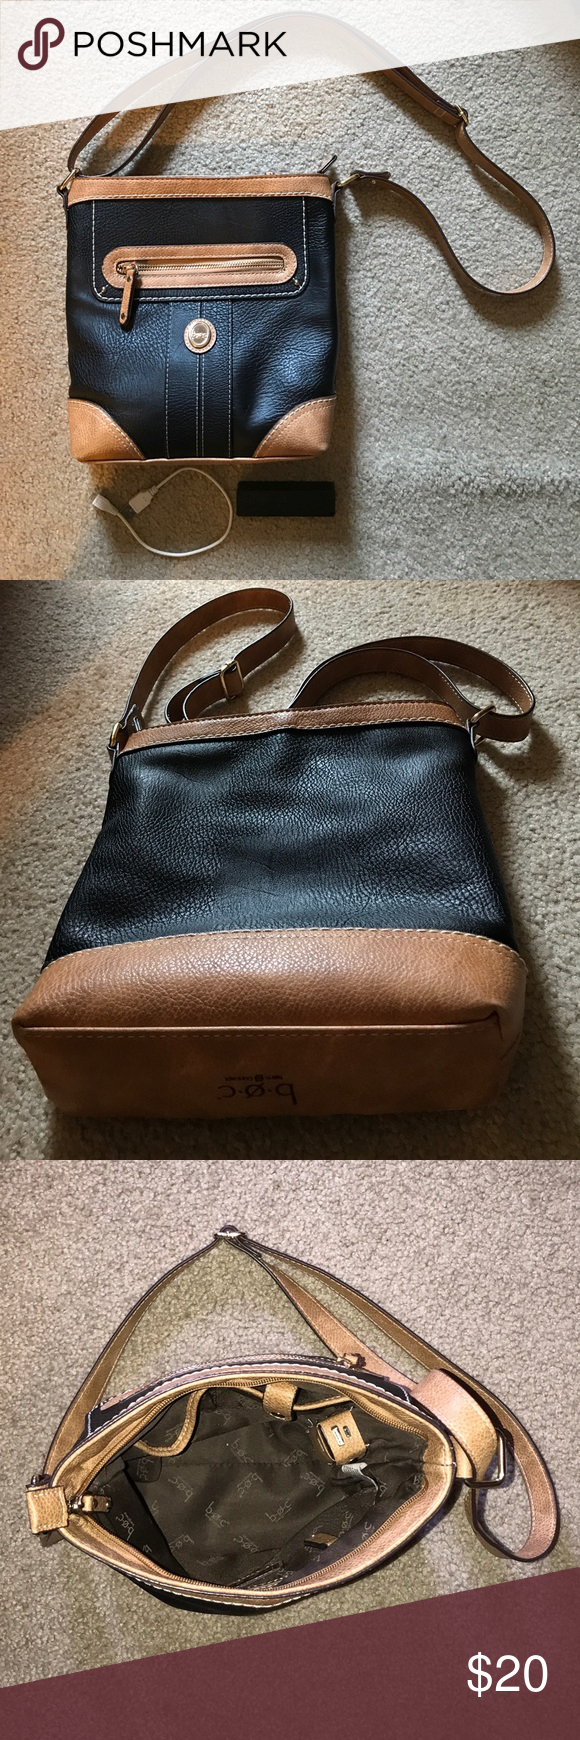 BOC crossbody bag, black/tan, comes w/power bank BOC vinyl